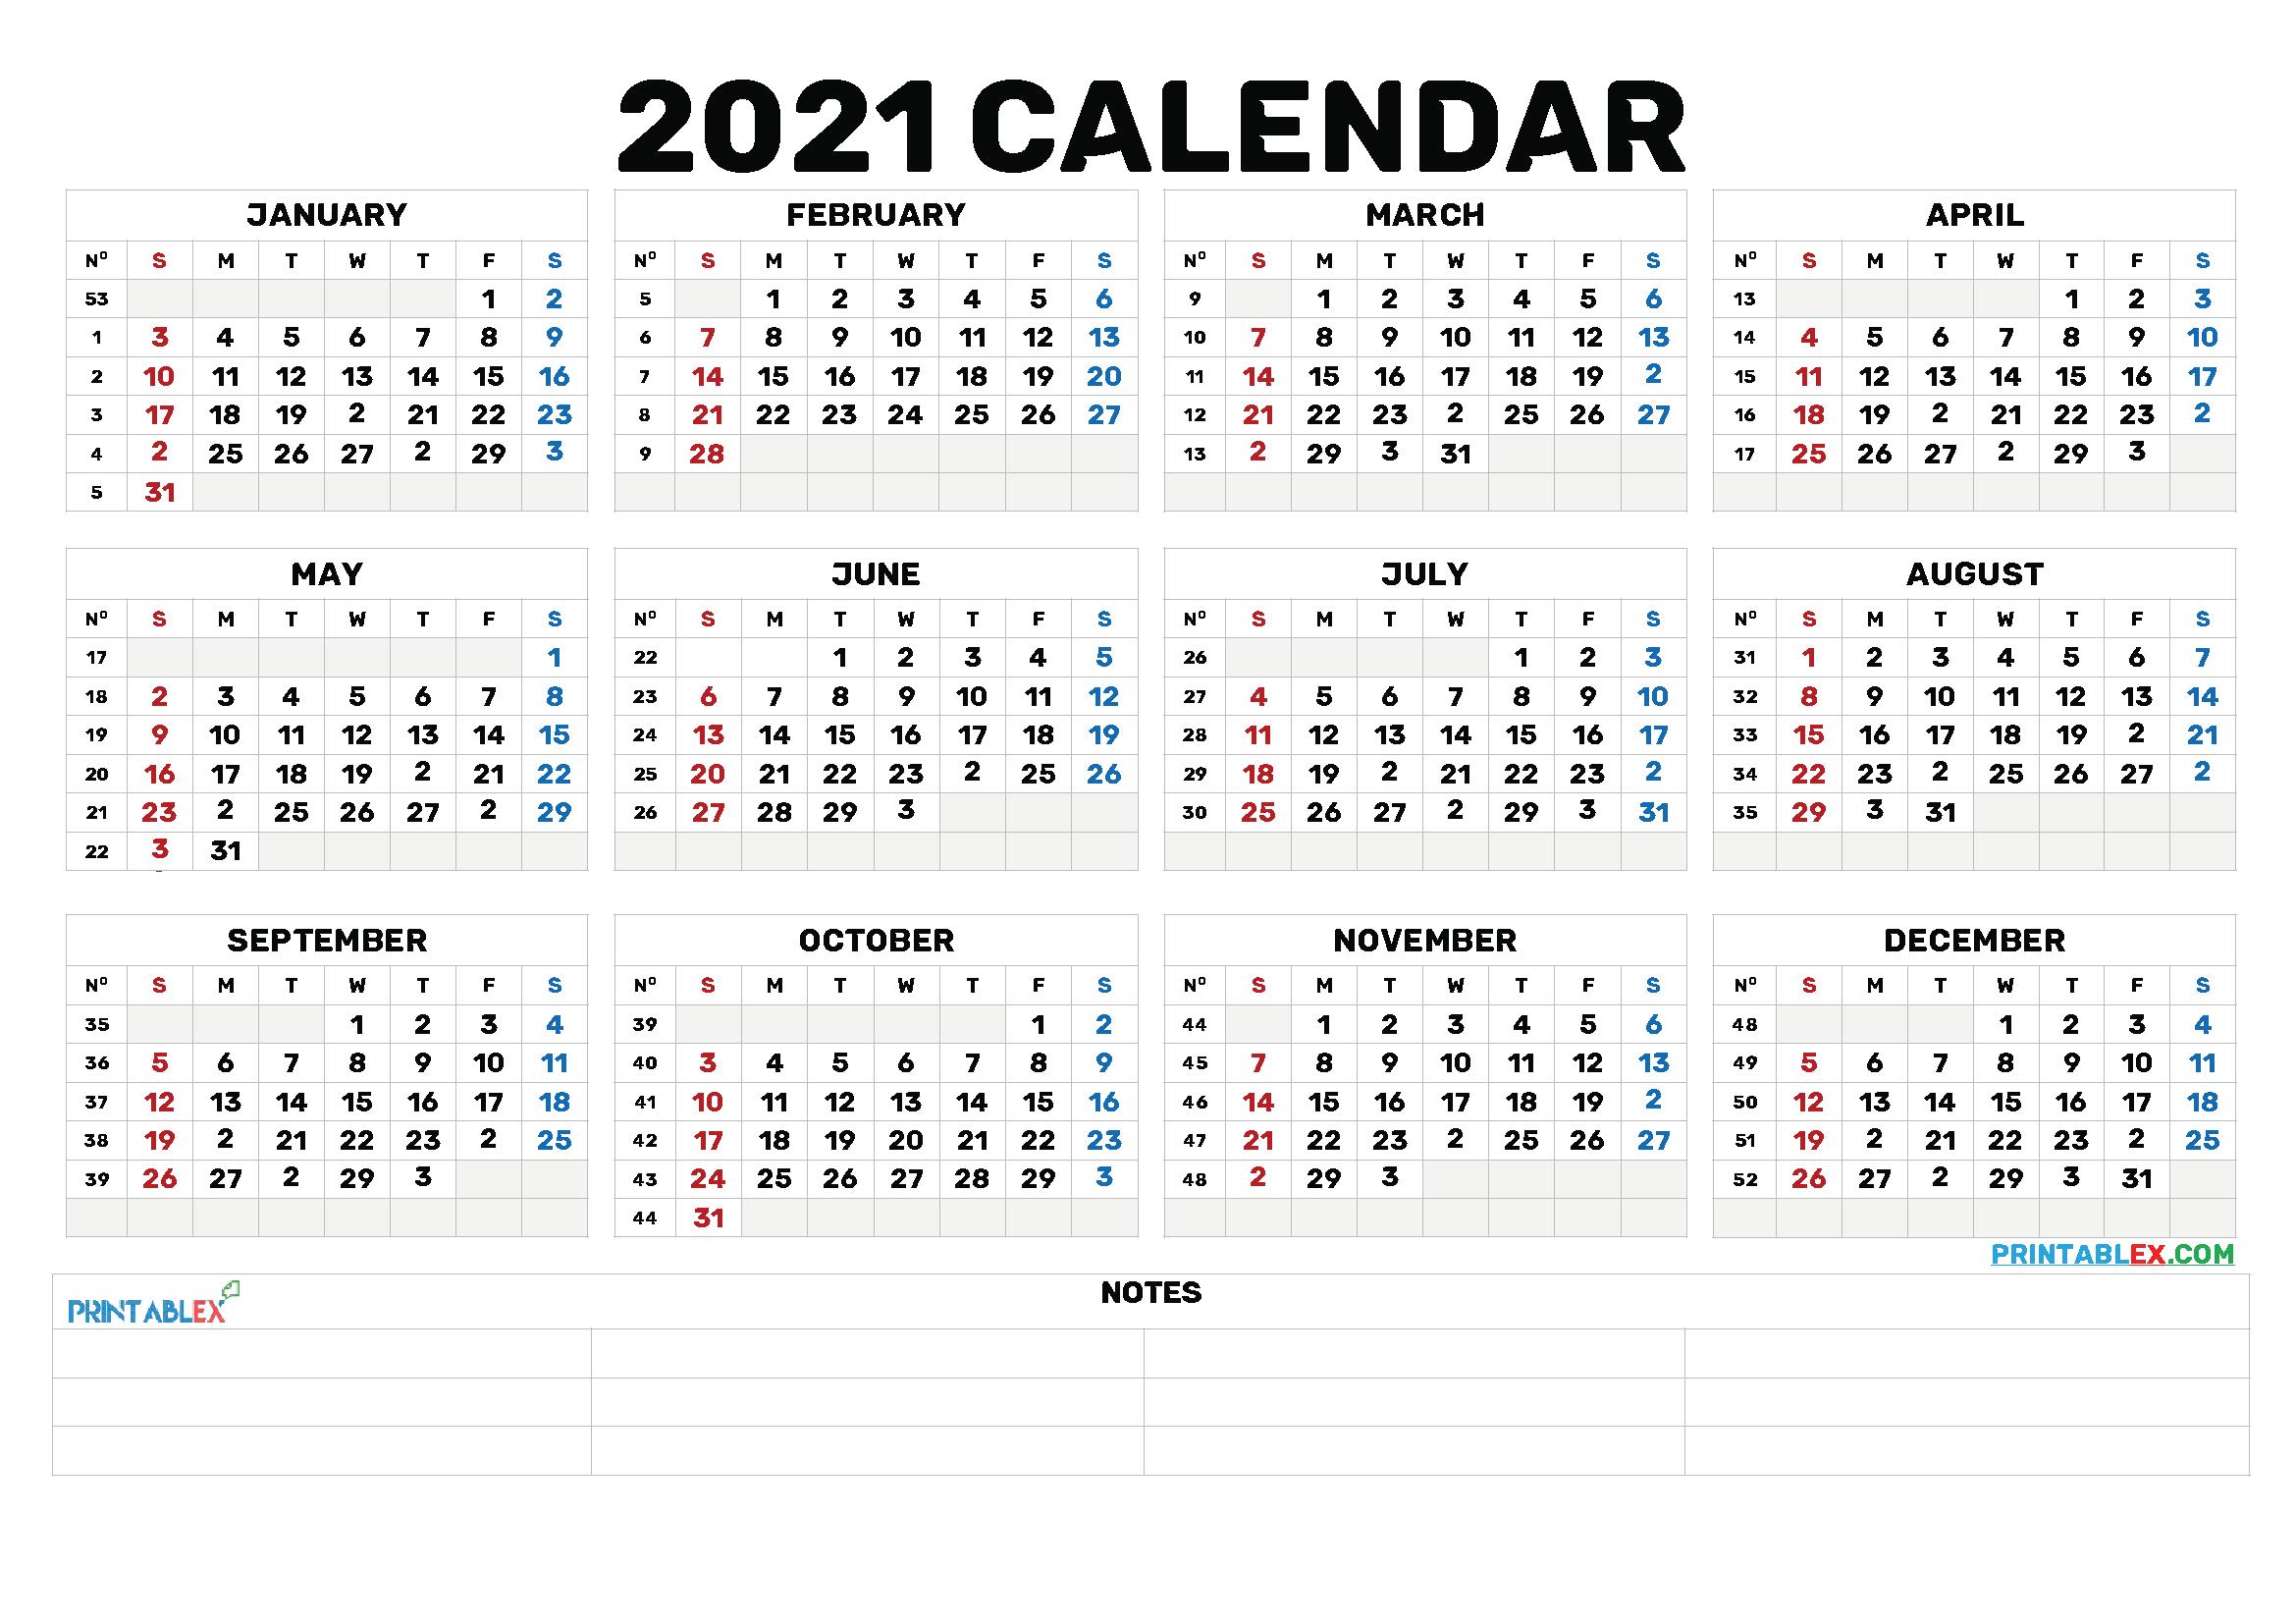 2021 Annual Calendar Printable - 21Ytw173 throughout Fill In Yearly Calendar 2021